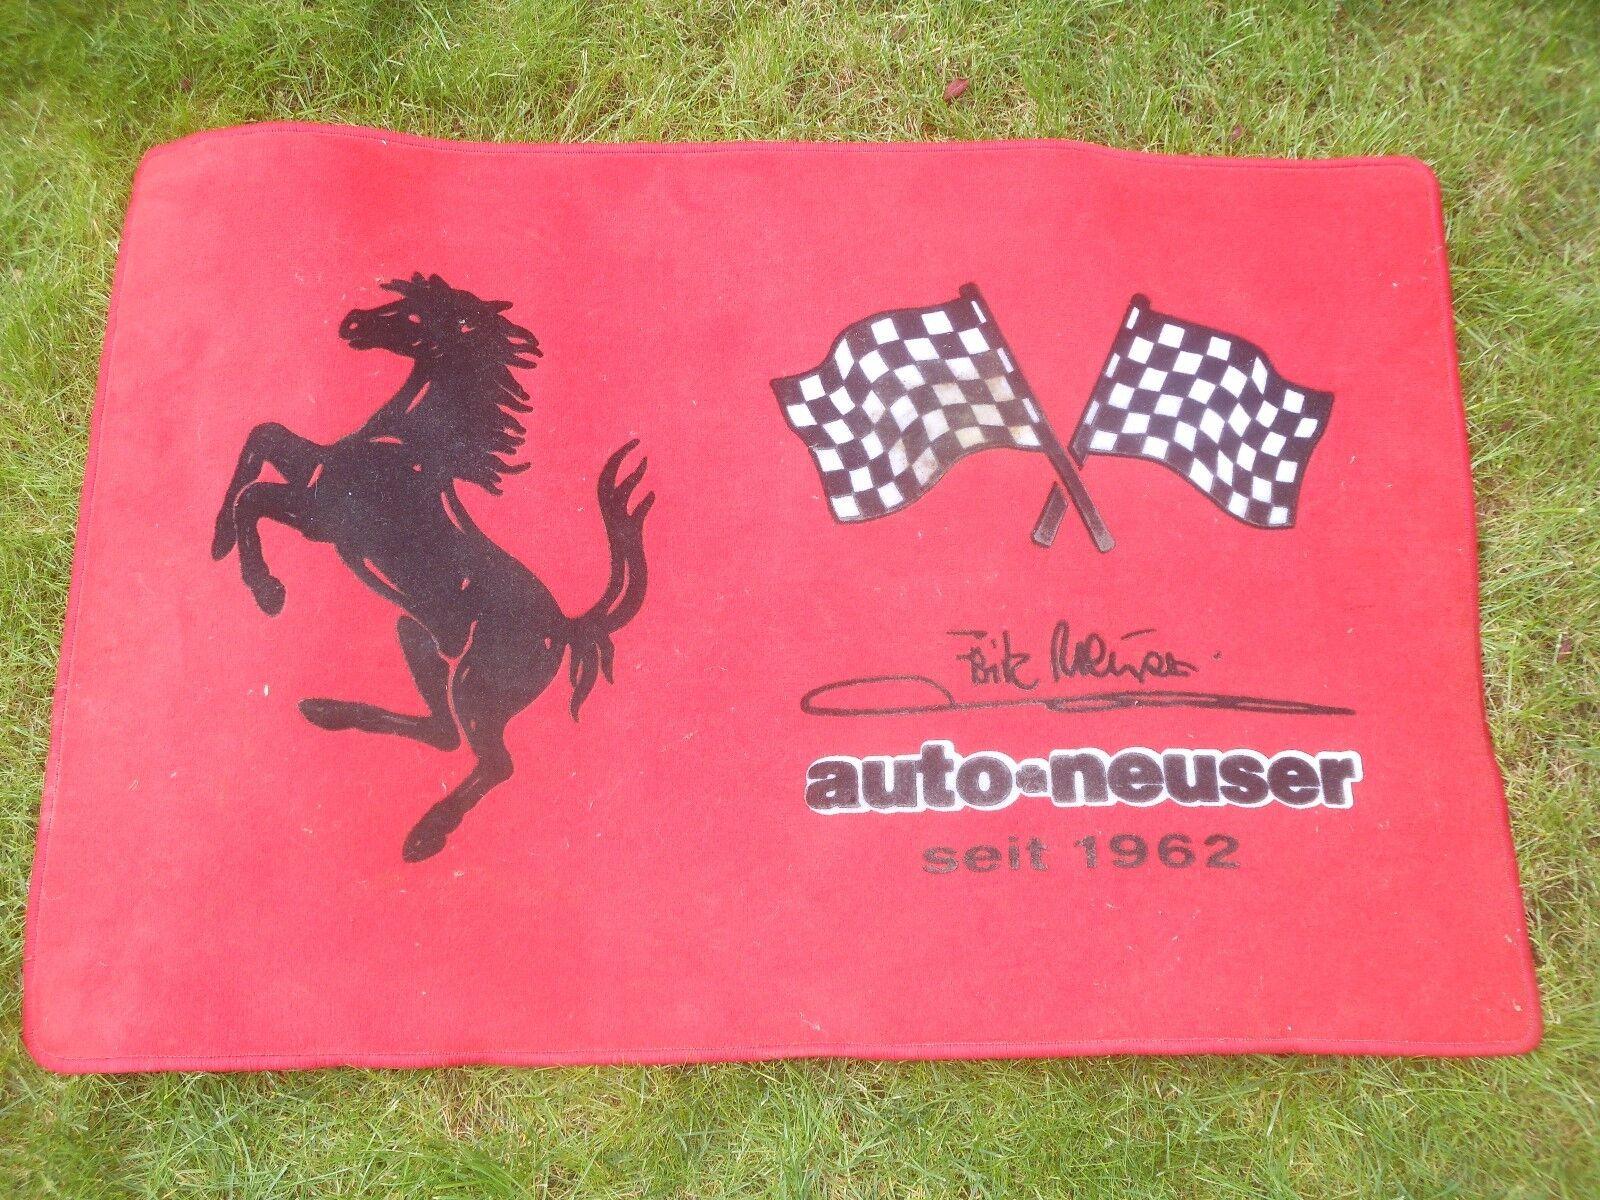 Original Ferrari Marchands de  tapis-Ferrari Neusser Nuremberg - 80 x 120 cm  gros prix discount